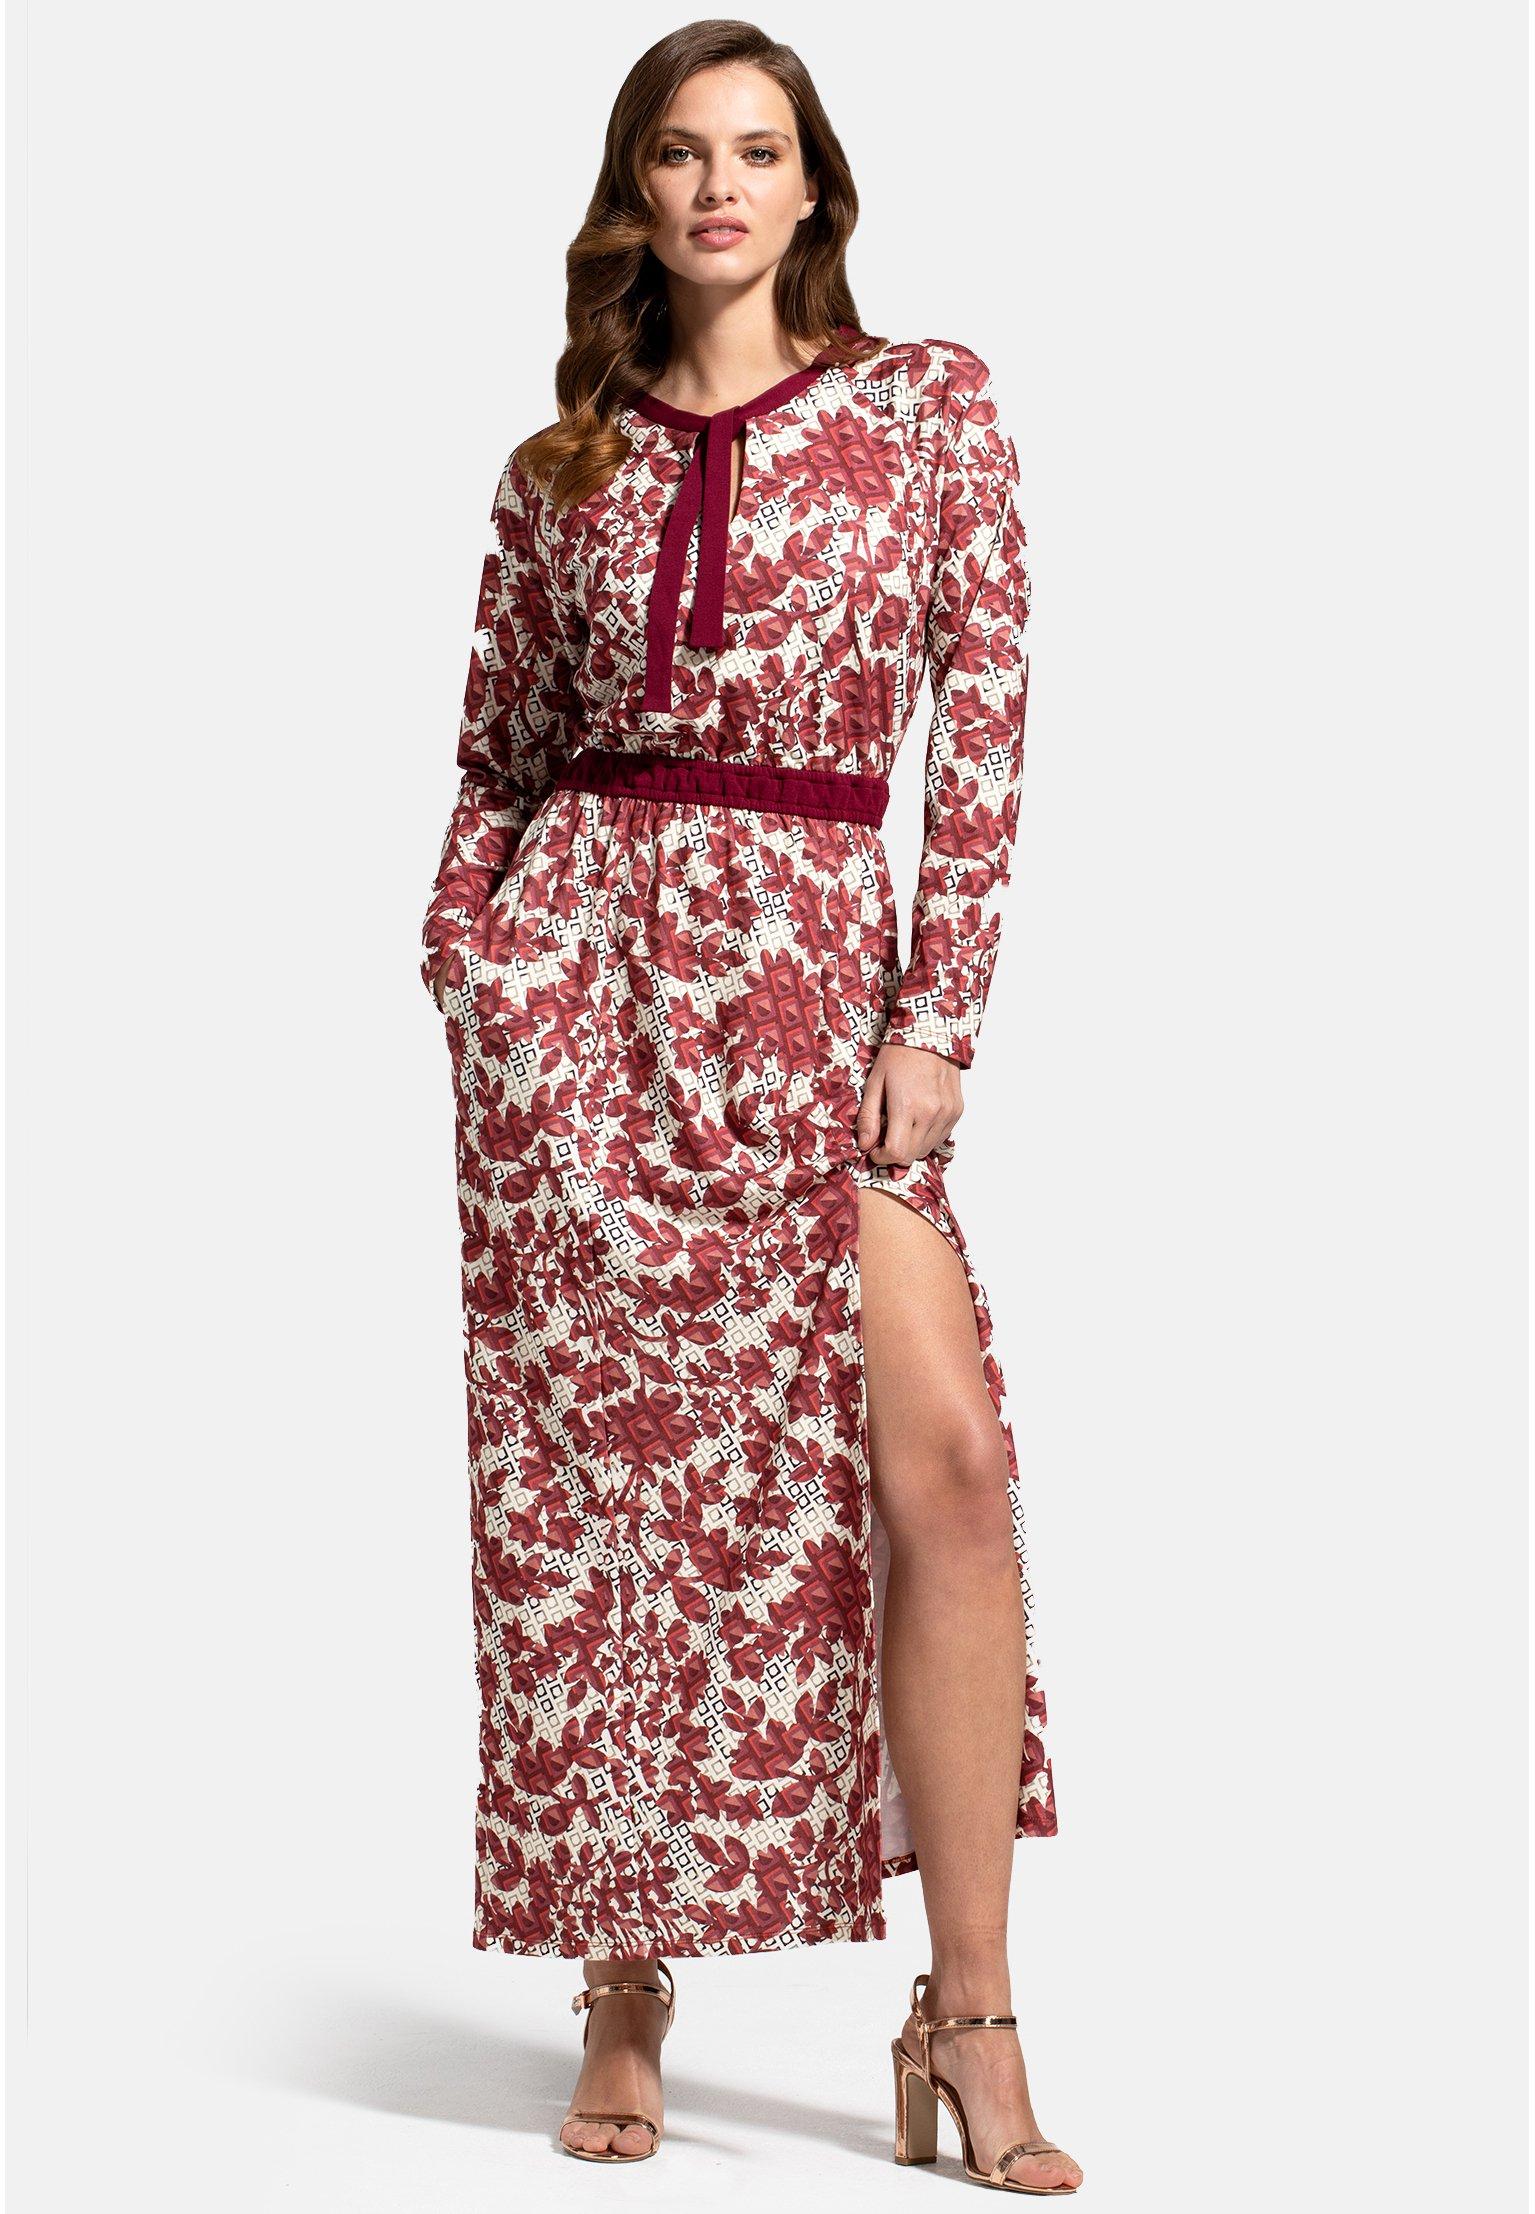 Donna WITH NECK TIE - Vestito lungo